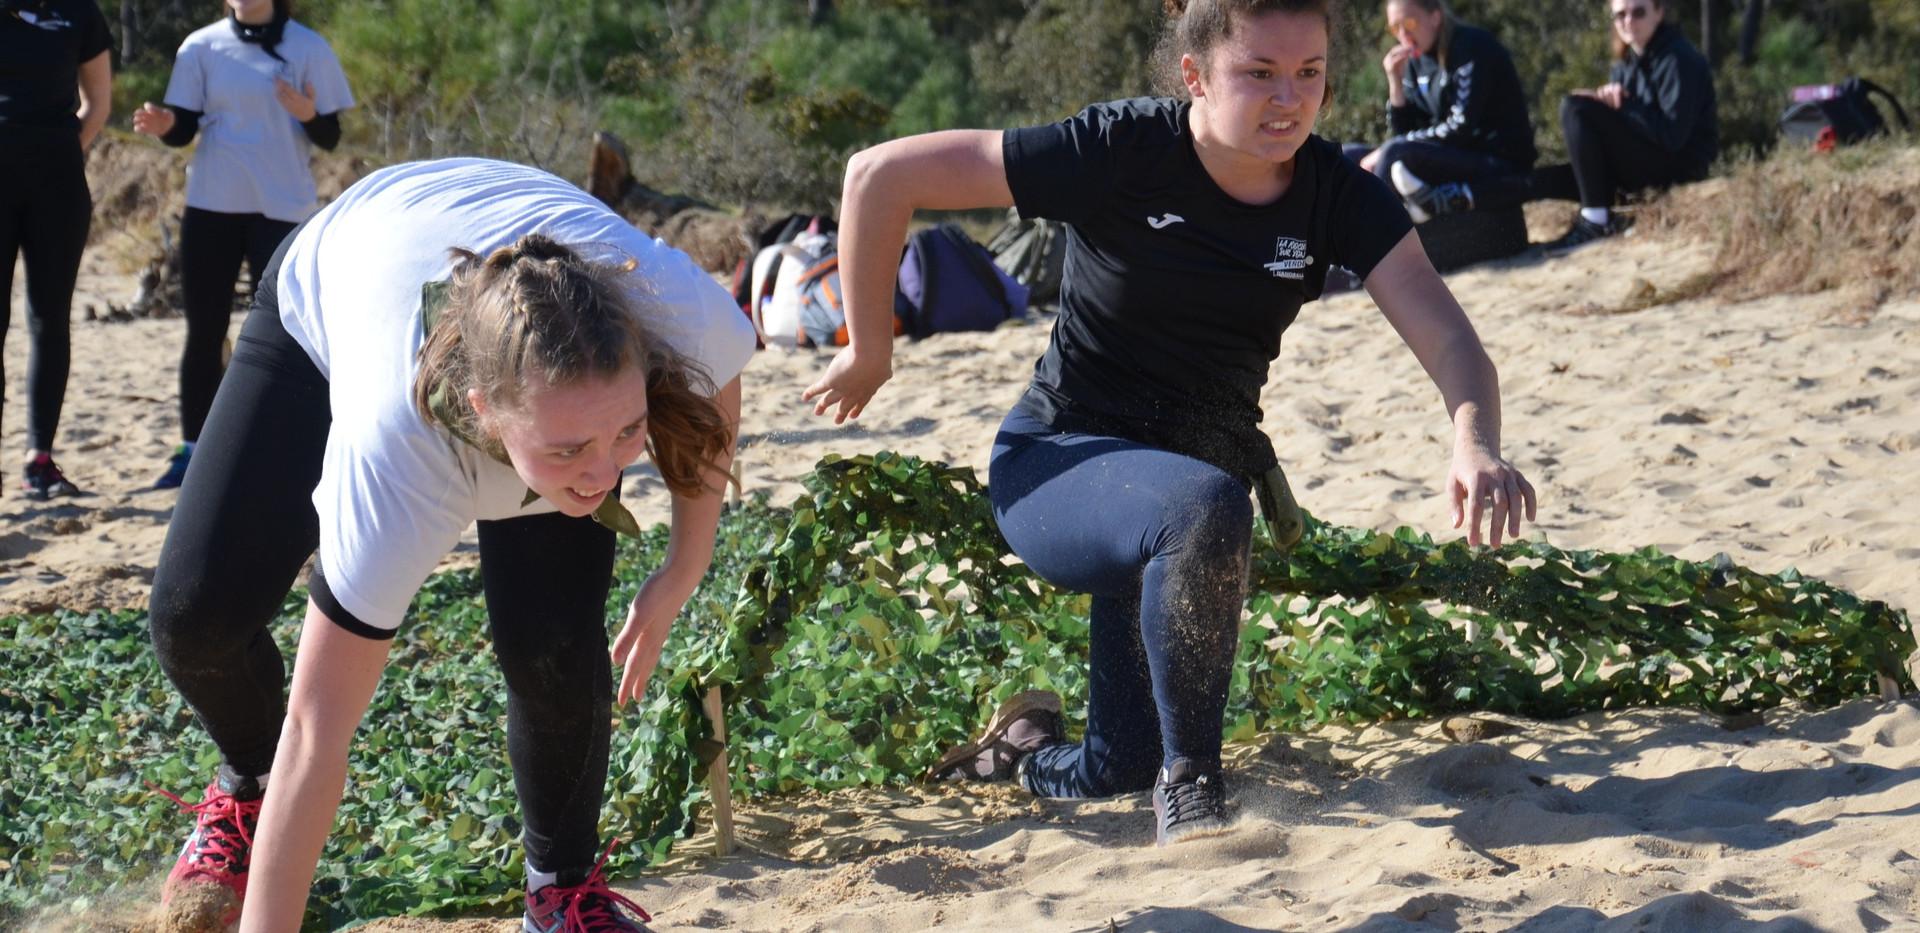 parcours-combattant-sable-handball-avent